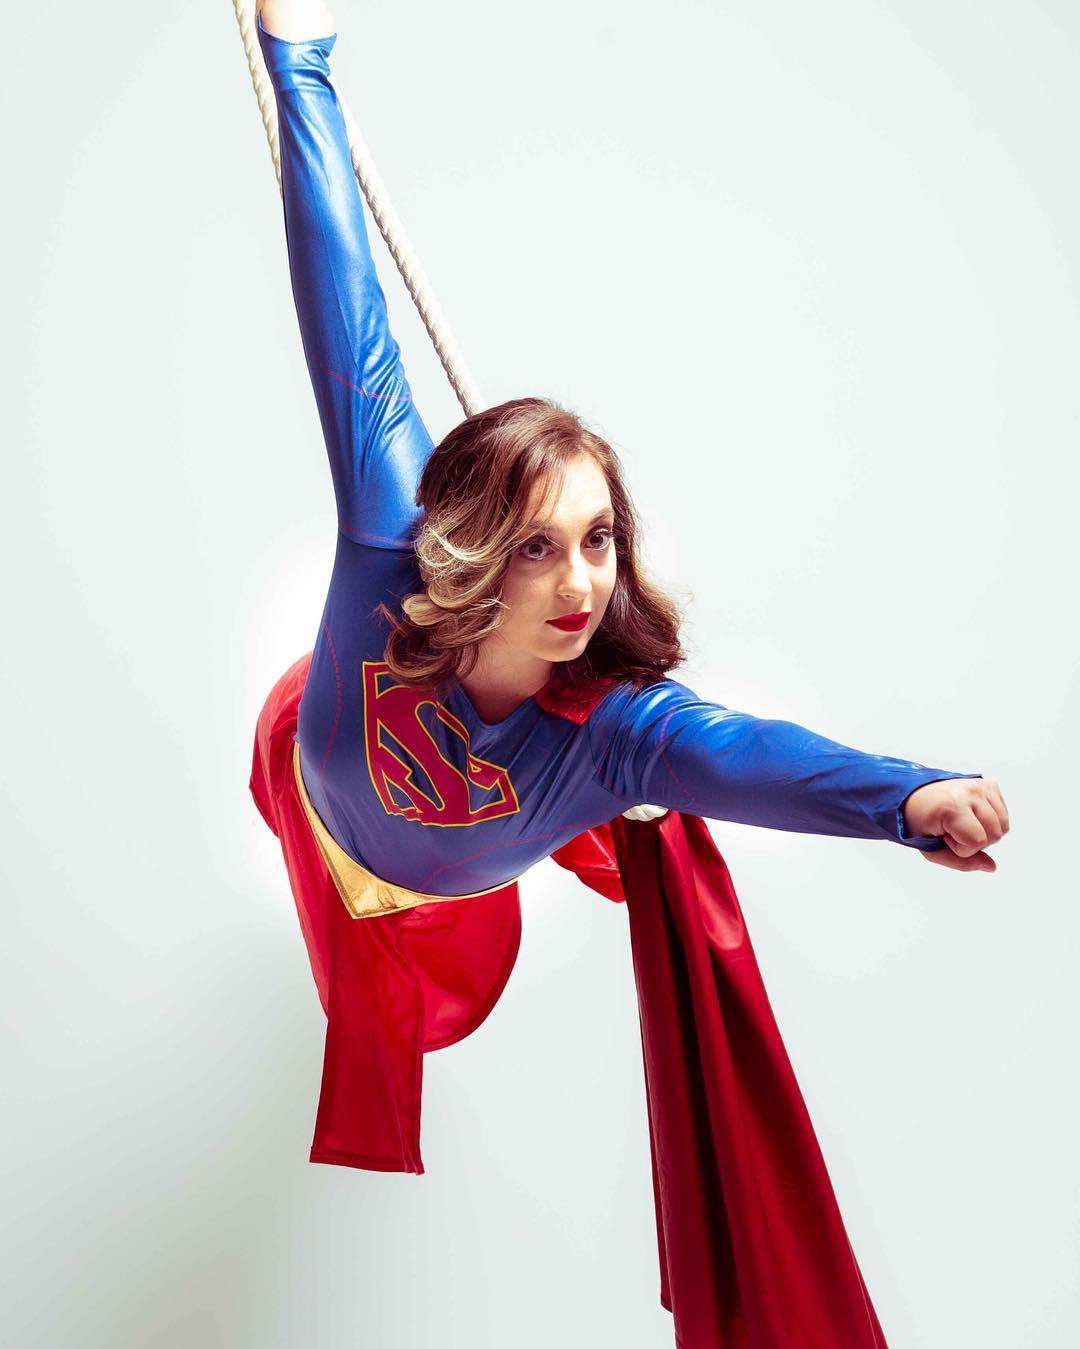 @the_metal_aerialist supergirl cosplay